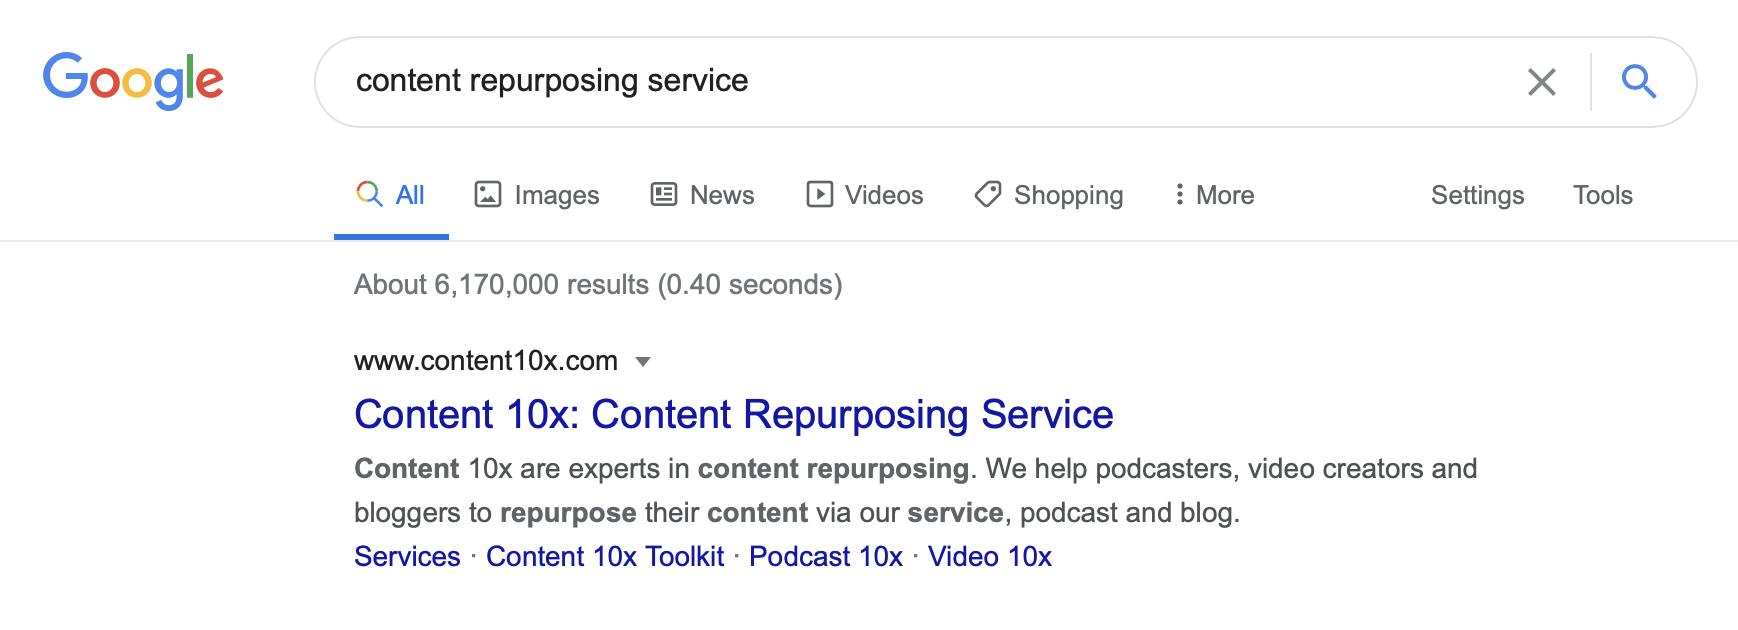 Content Repurposing Service on Google